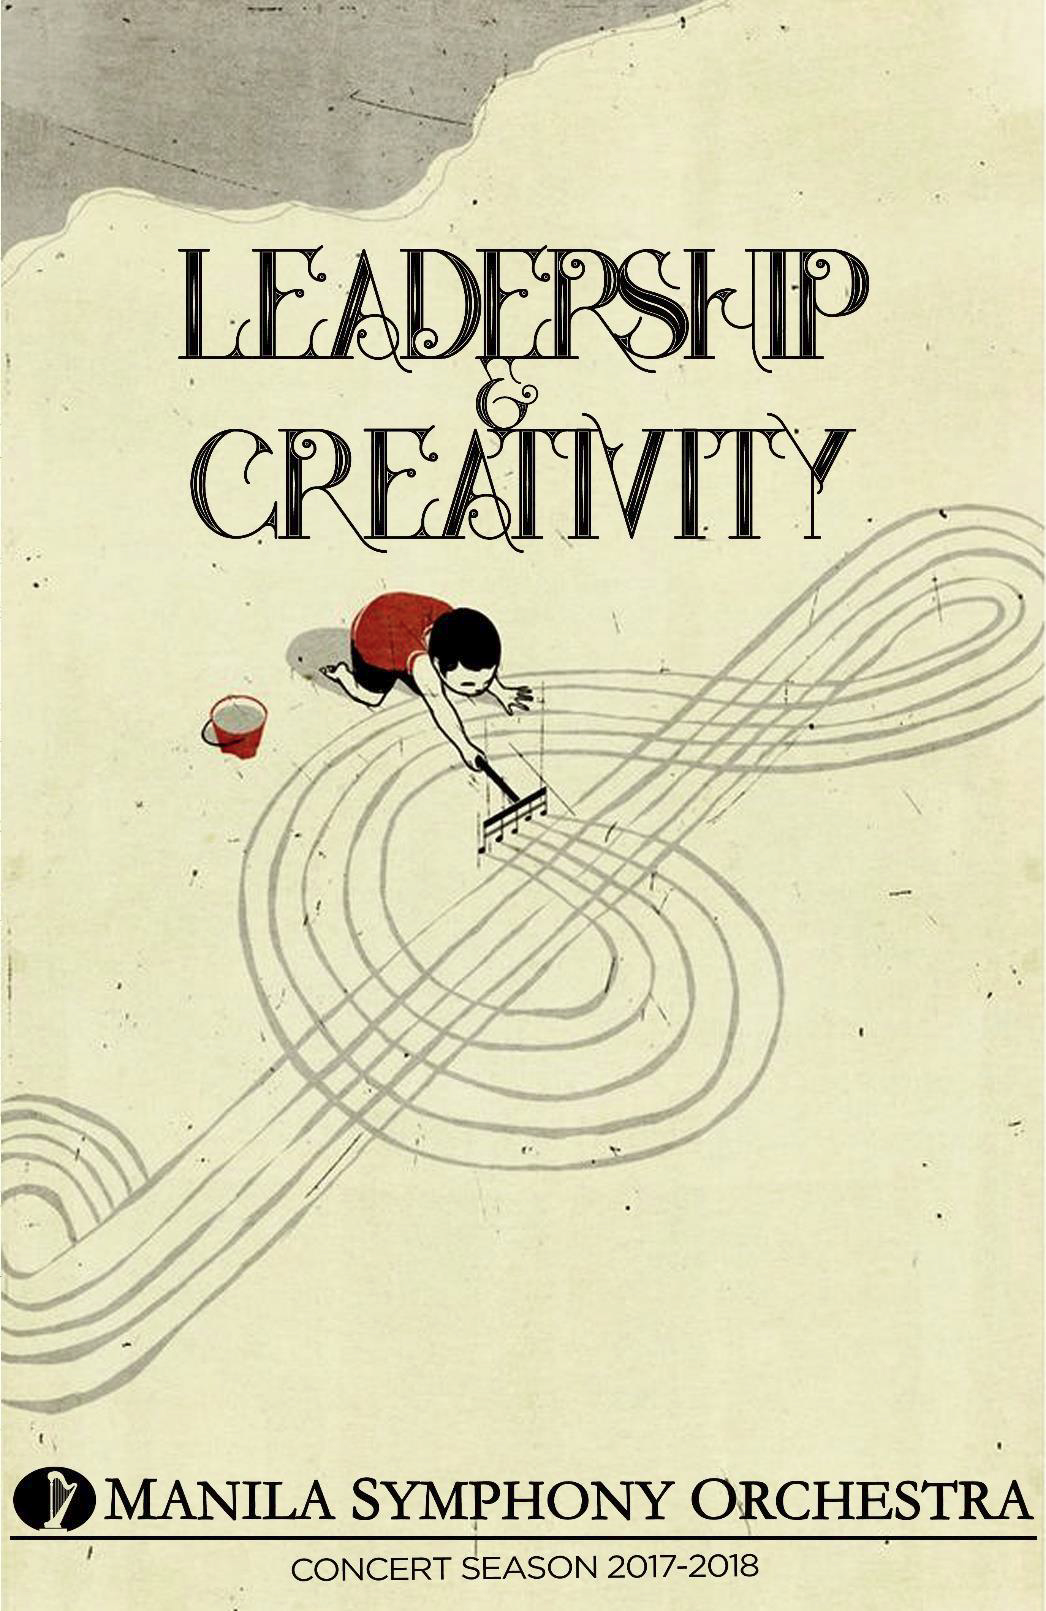 170603_leadership-creativity